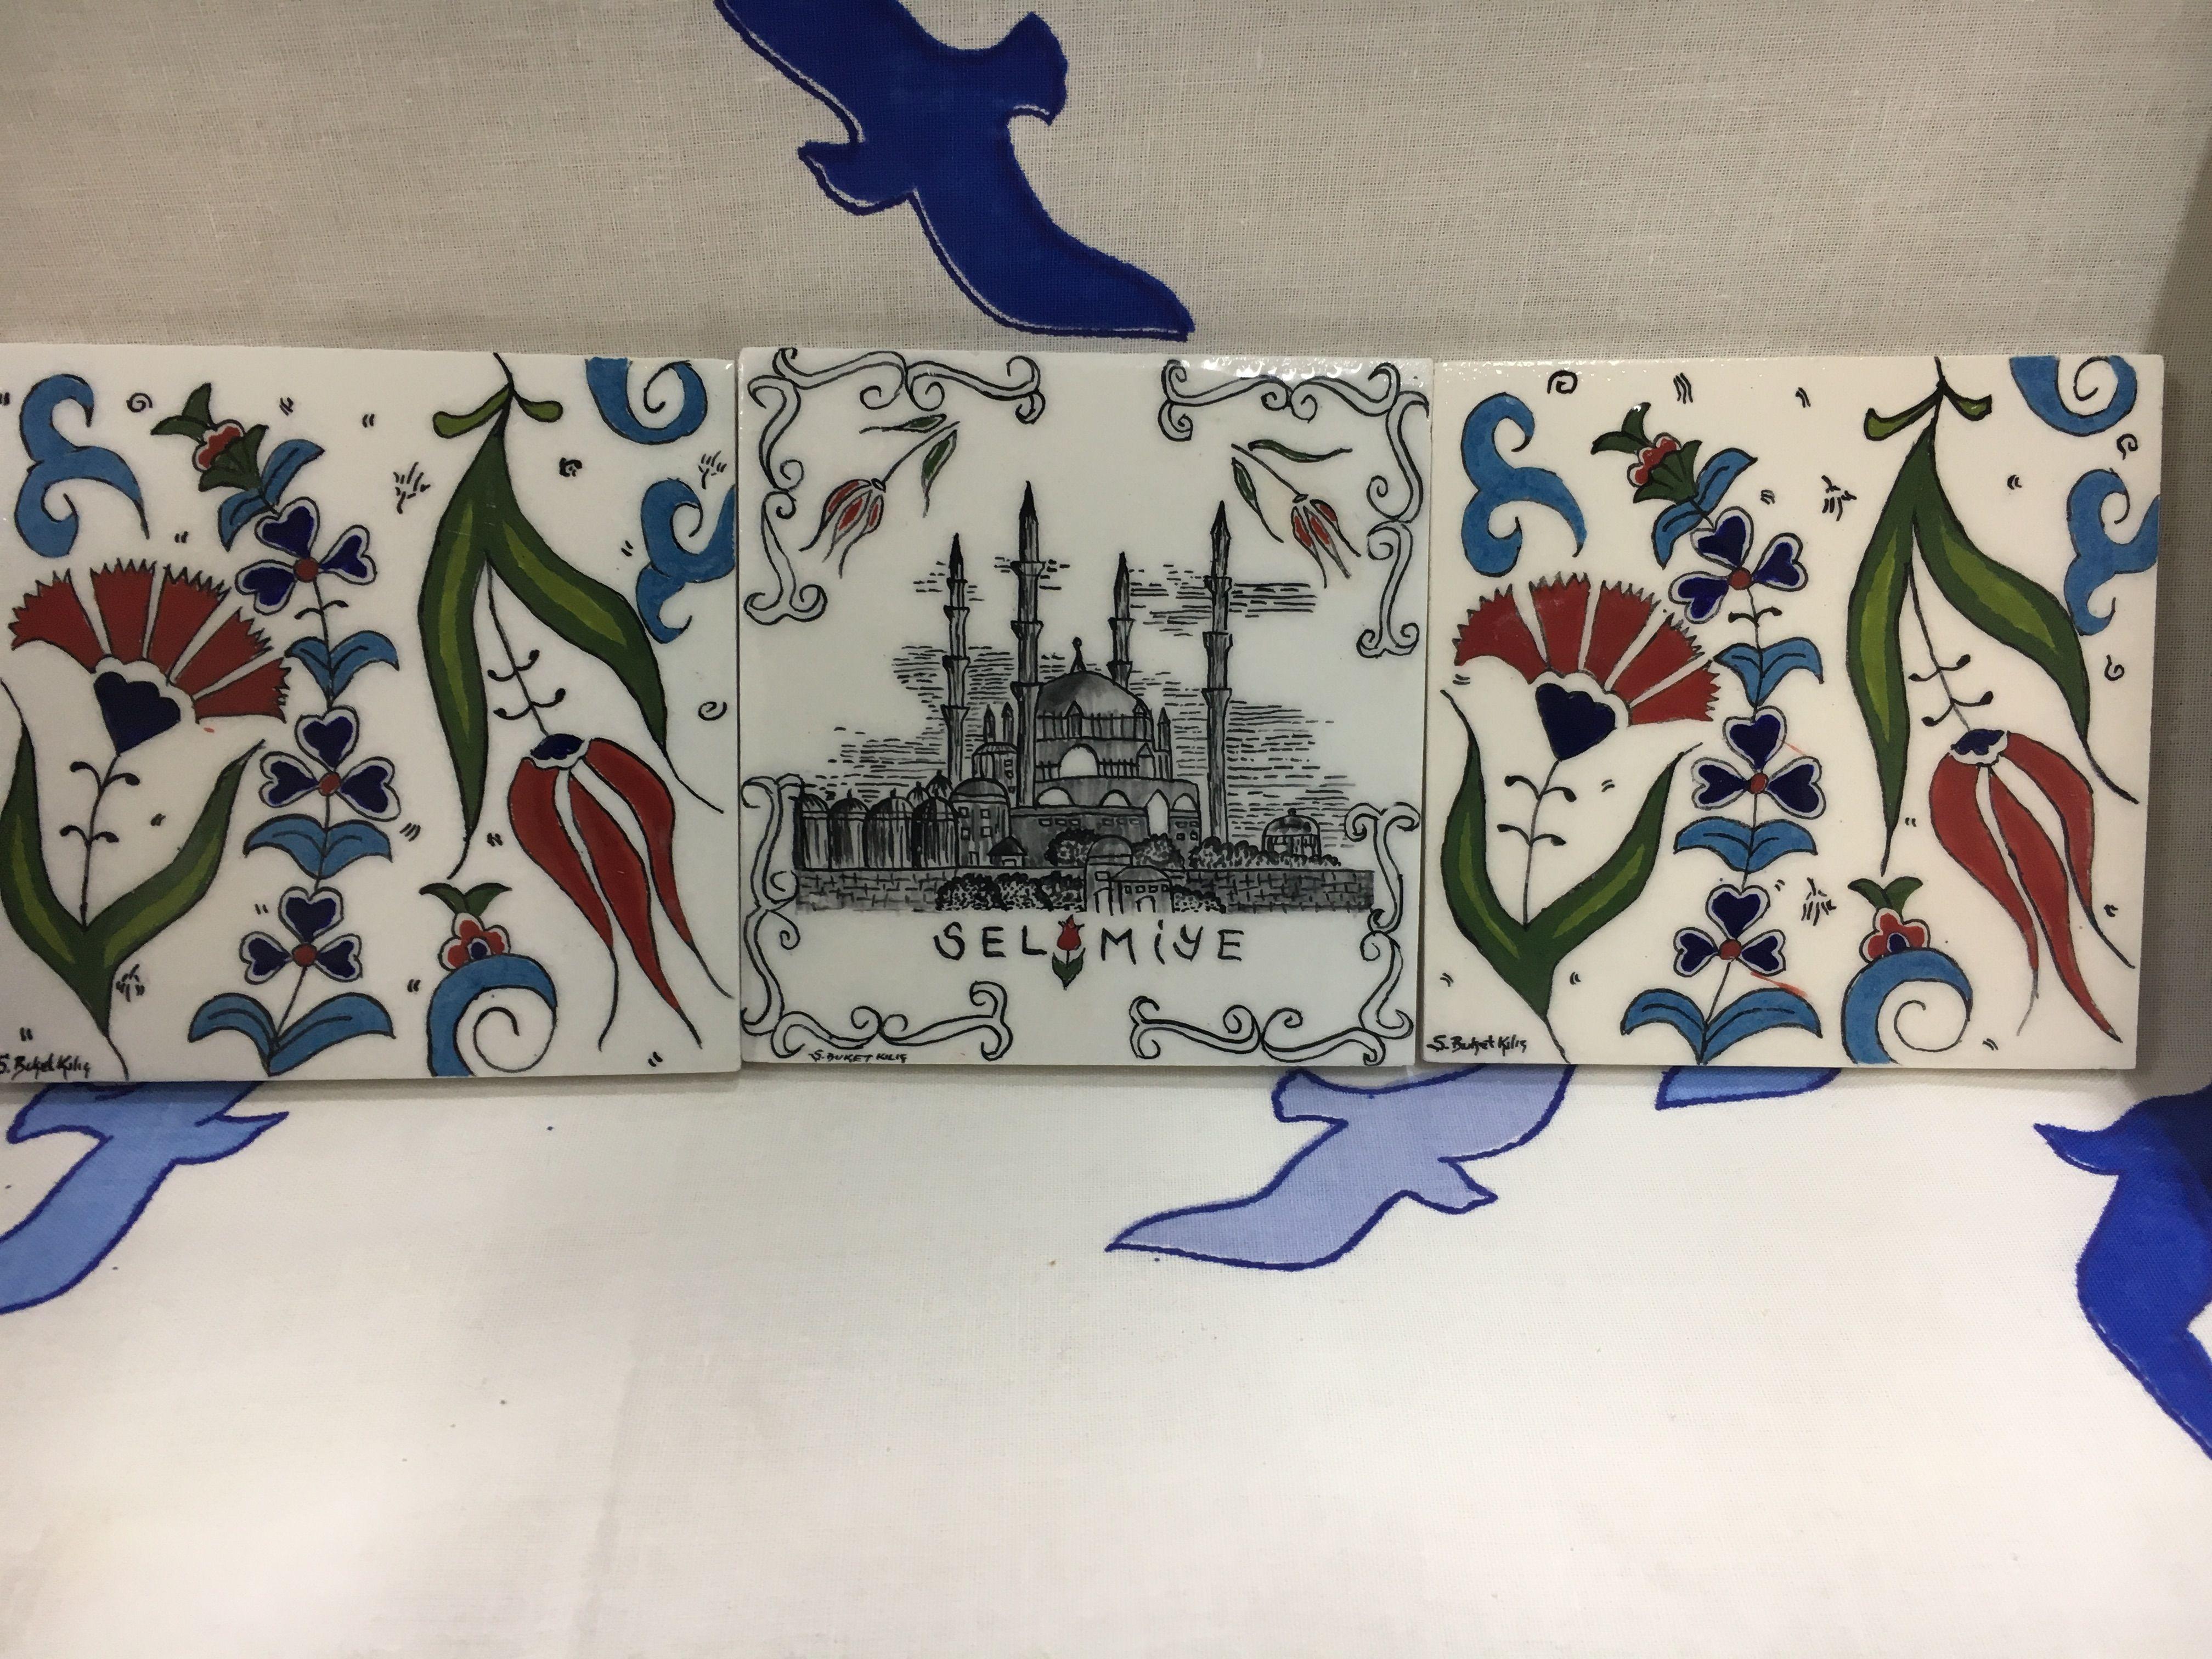 Edirne Selimiye Cami Karanfil Ve Ters Lale Cini Karo Calismasi Laleler Seramik Camiler